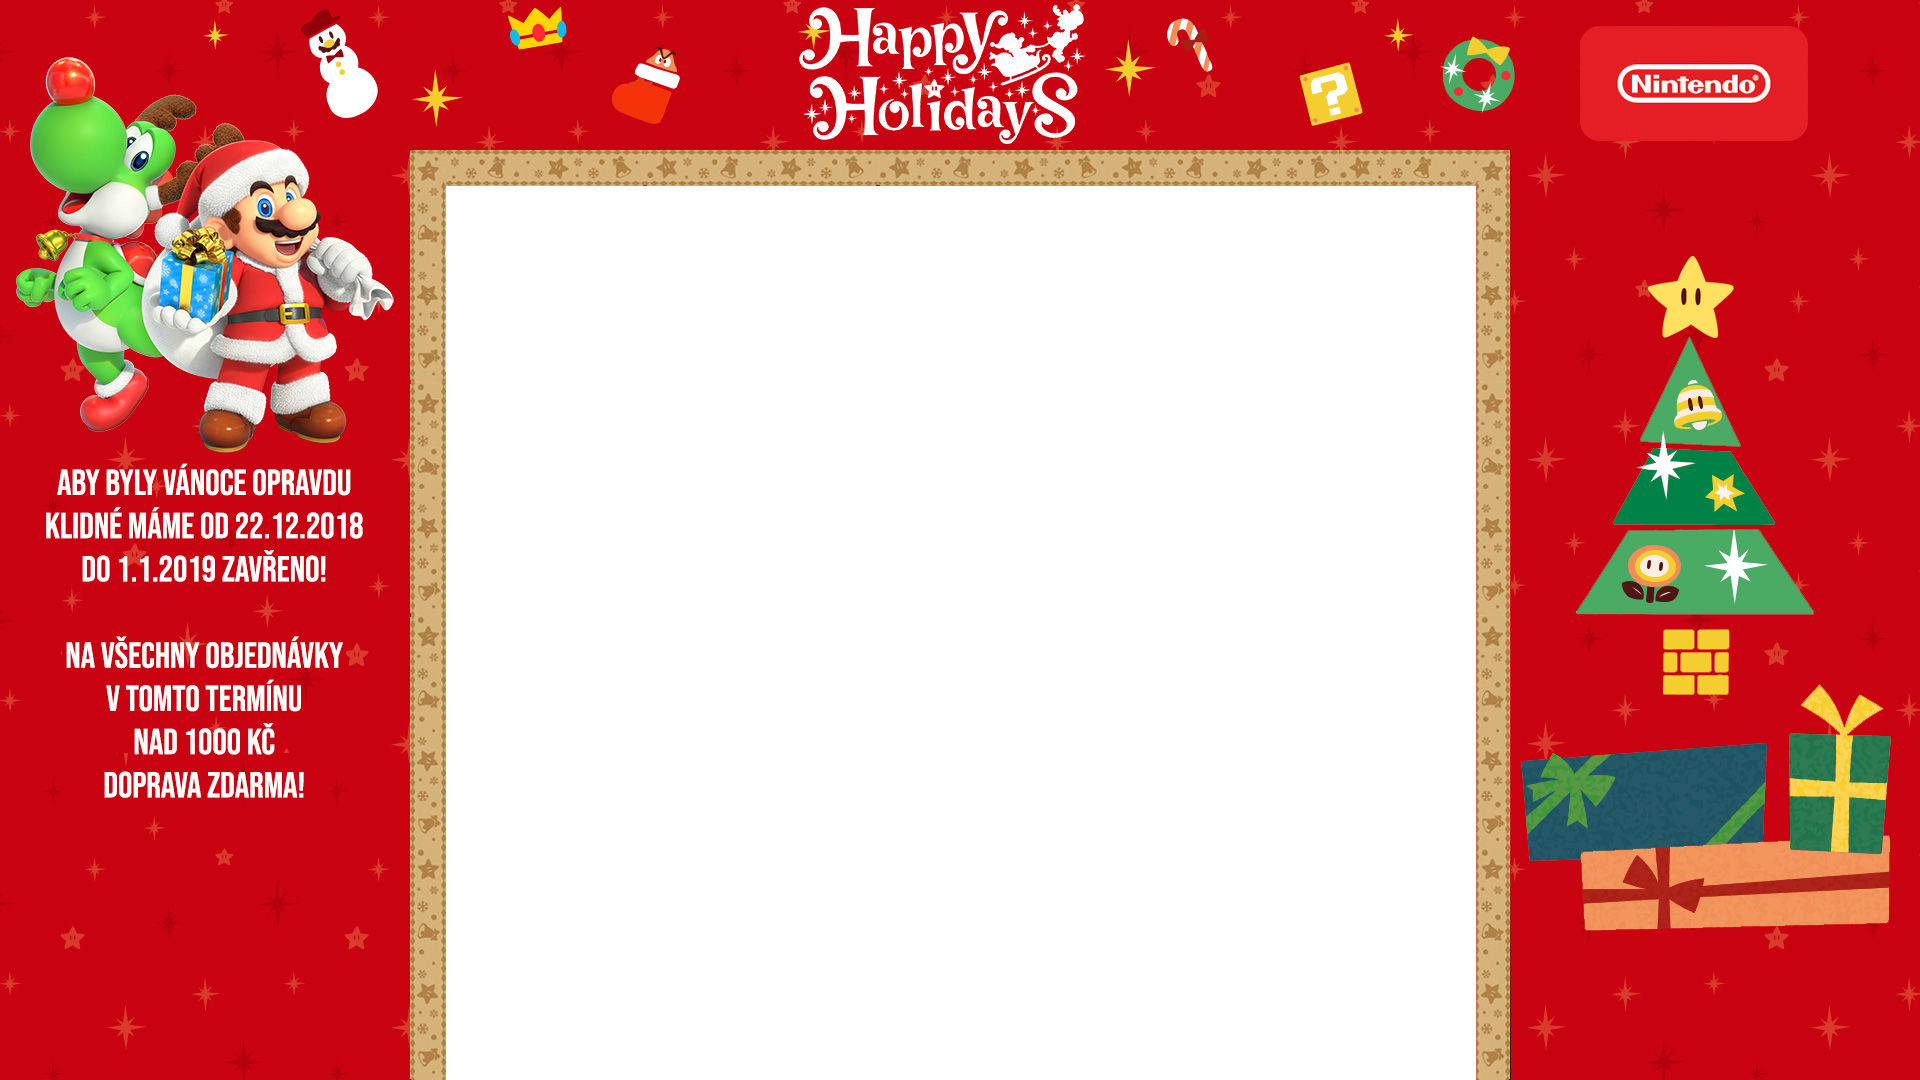 Vánoce s nintendoshop